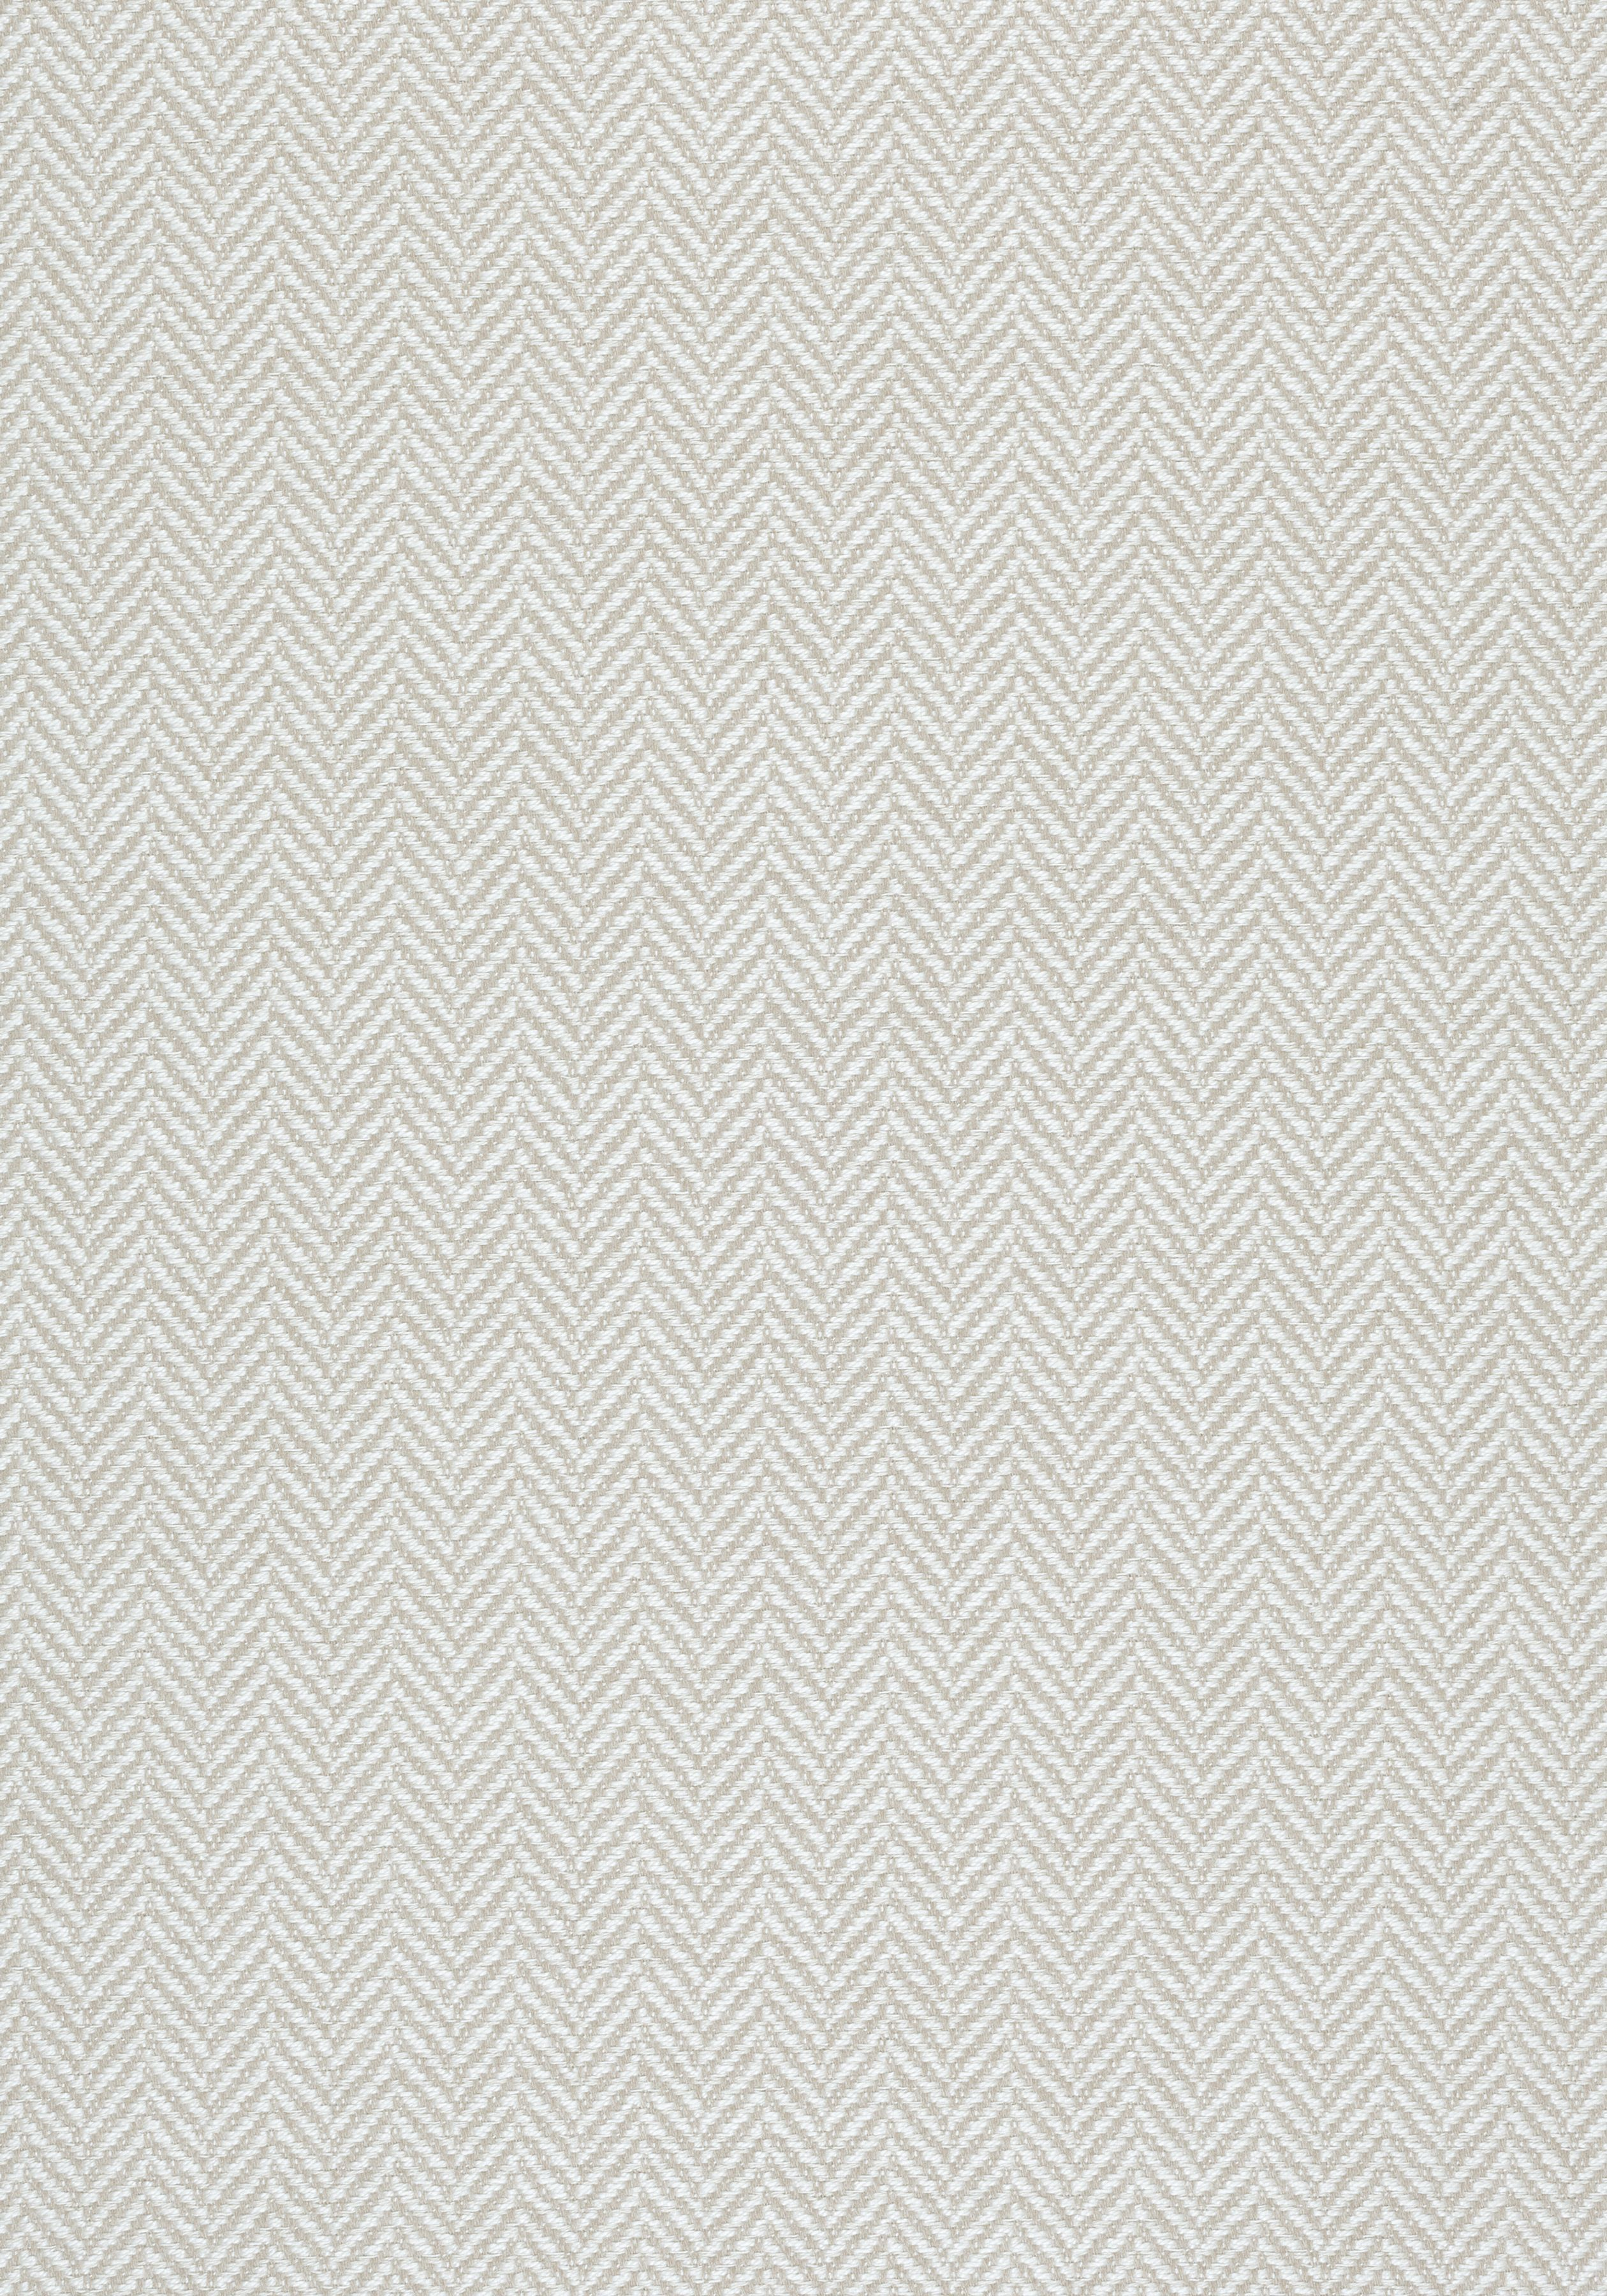 HOLLIS HERRINGBONE, Linen, W80743, Collection Solstice from Thibaut